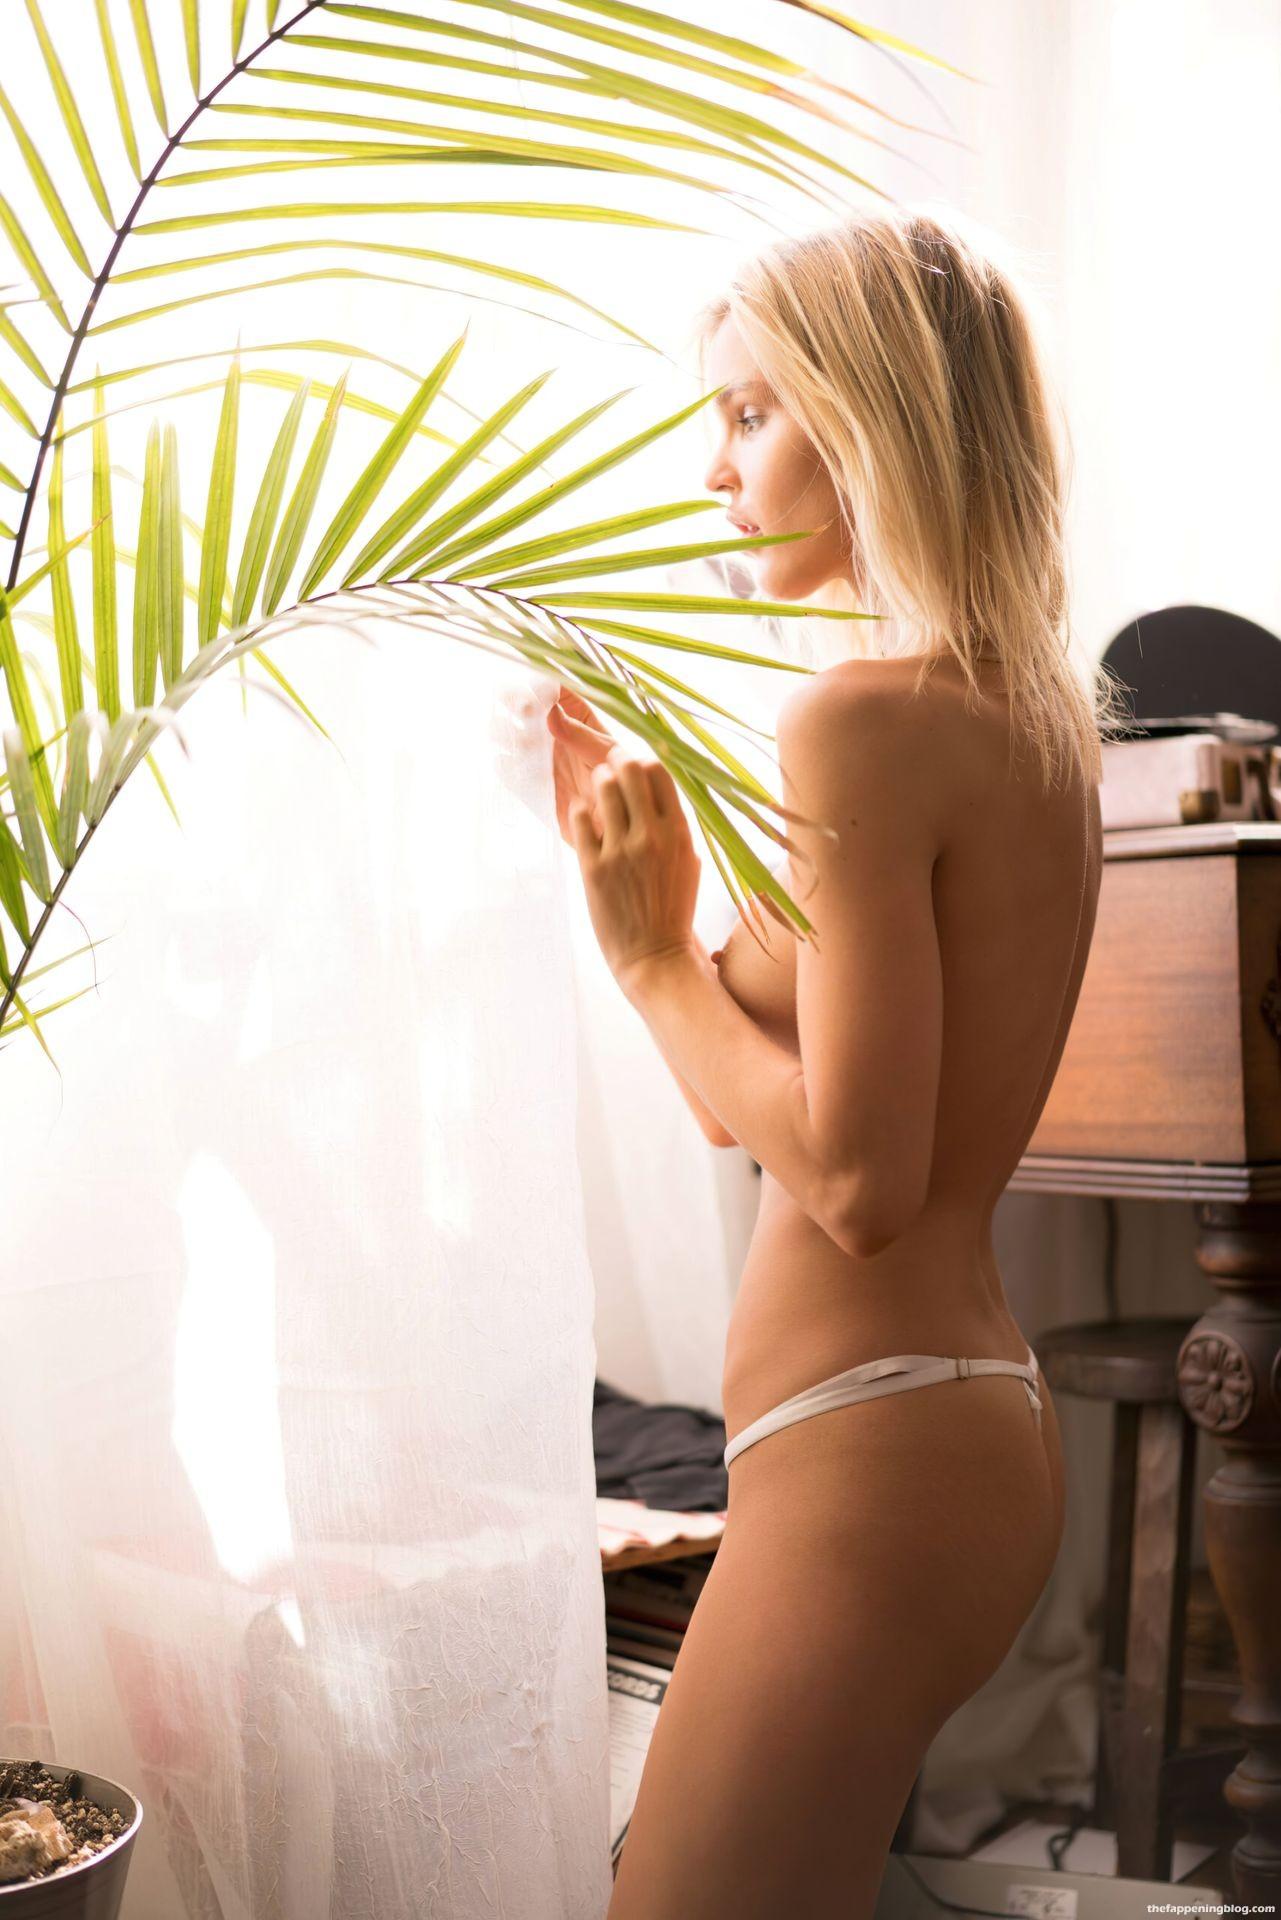 Joy-Corrigan-Naked-Tits-and-Ass-7-scaled1-thefappeningblog.com_.jpg